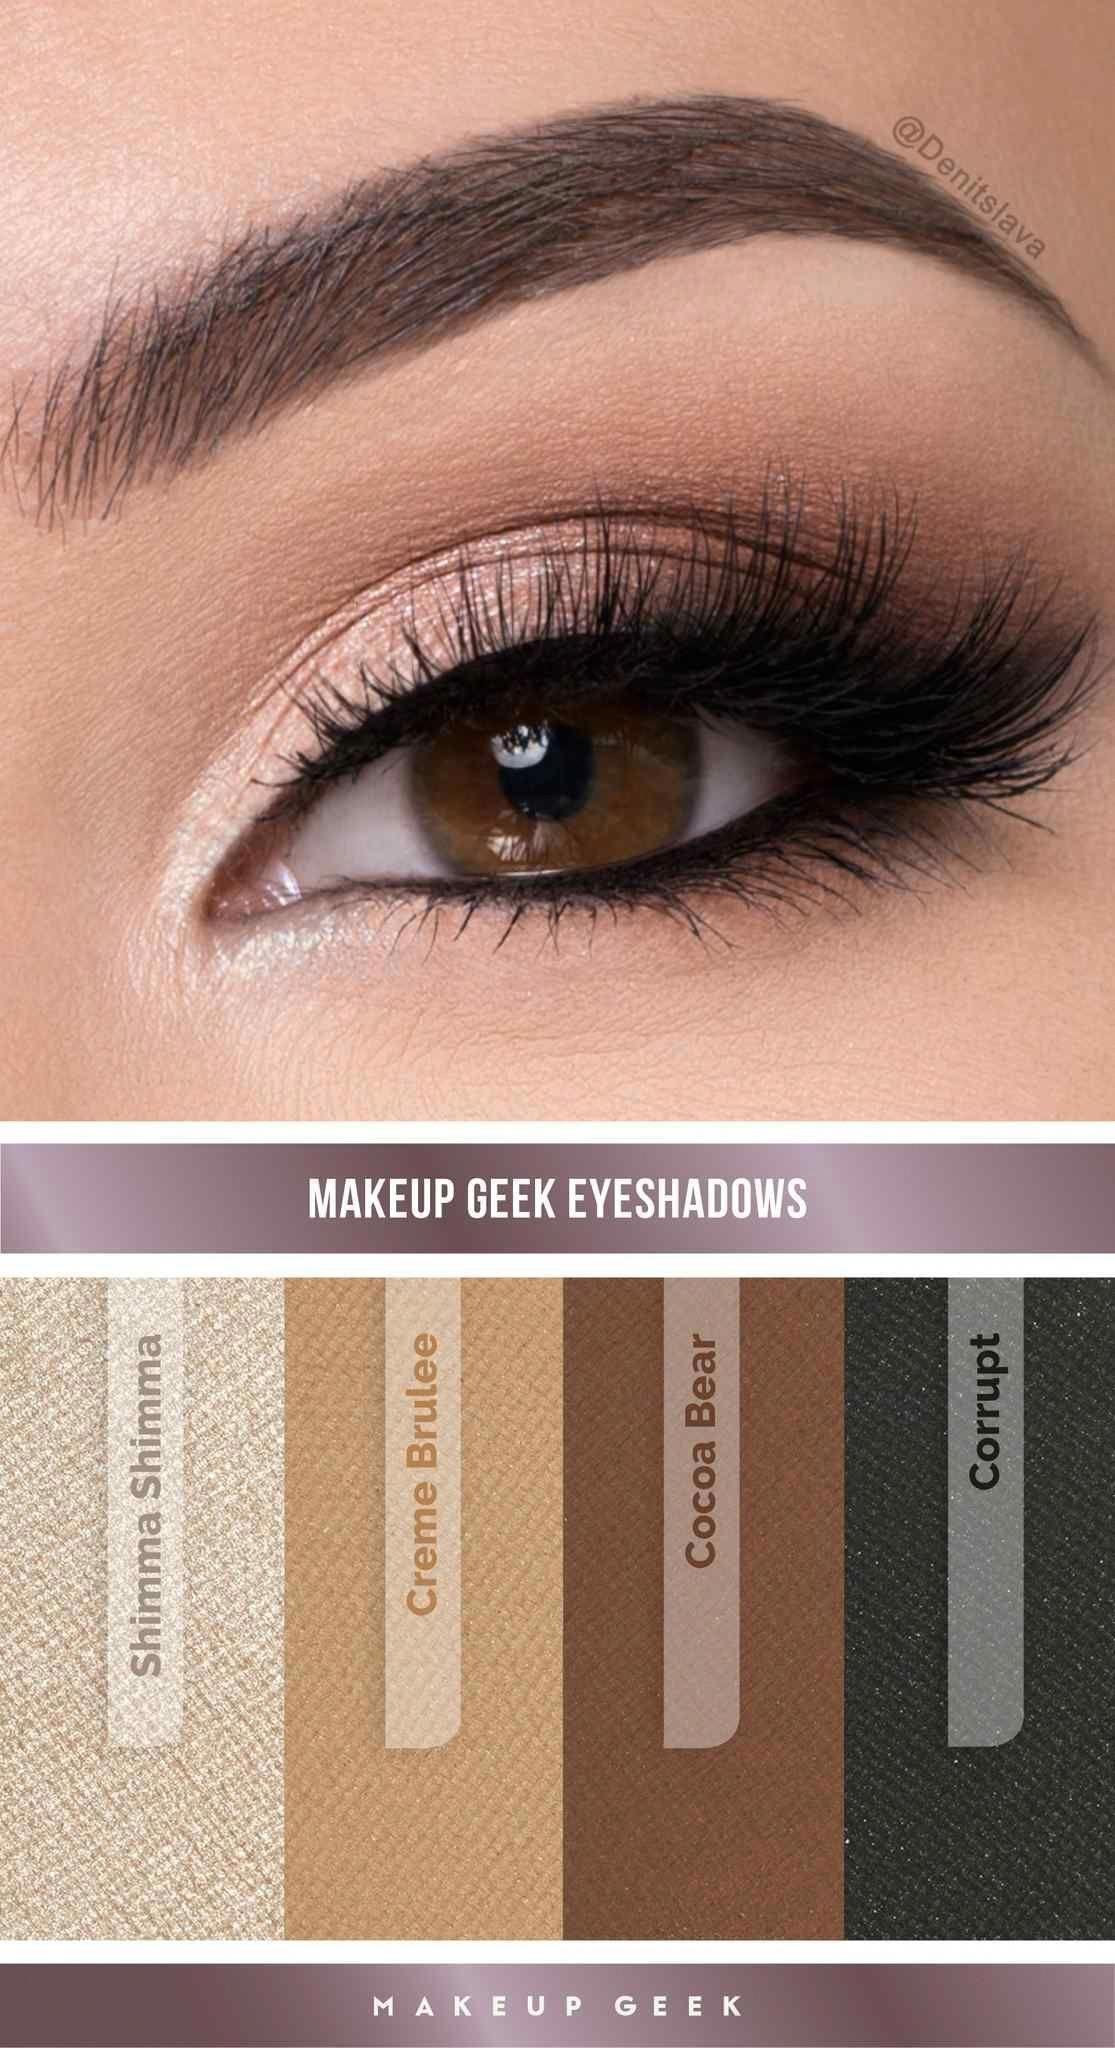 6 beauty secrets I learned at makeup artist school